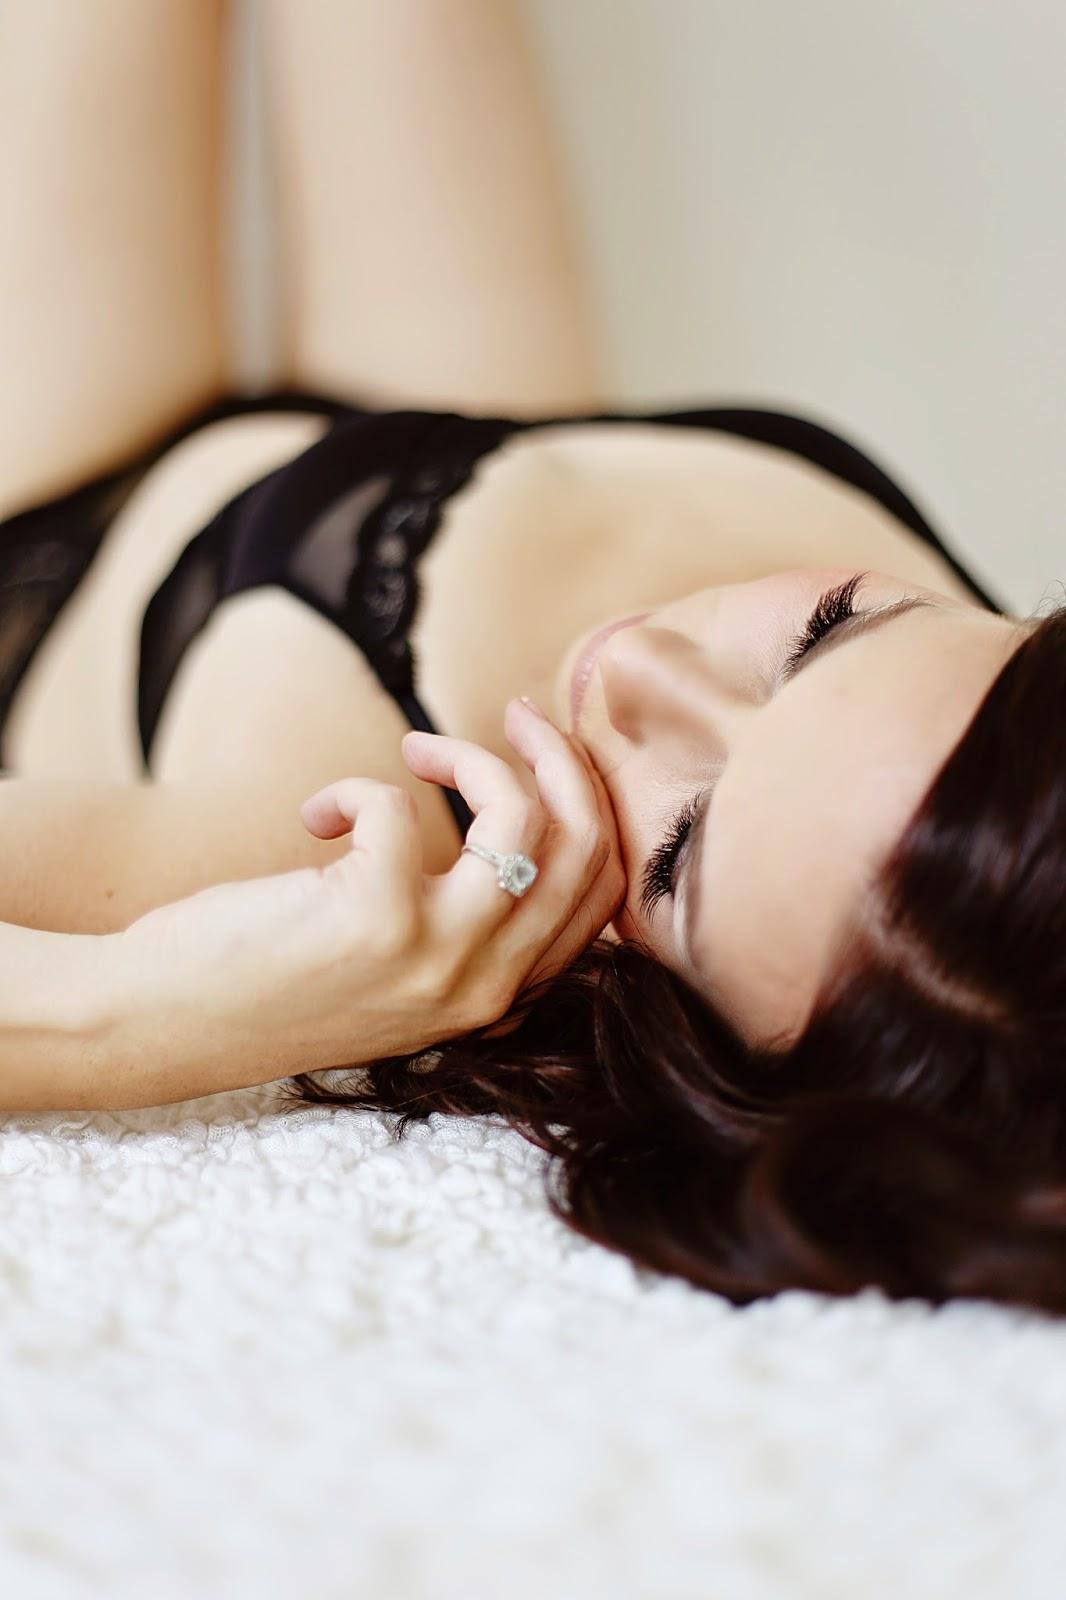 portland boudoir, gresham boudoir, oregon boudoir photographer, reveal, boudoir, powder inc, hair, makeup, natural light studio, jenn pacurar, nicole wagner, lingerie, sexy, beautiful